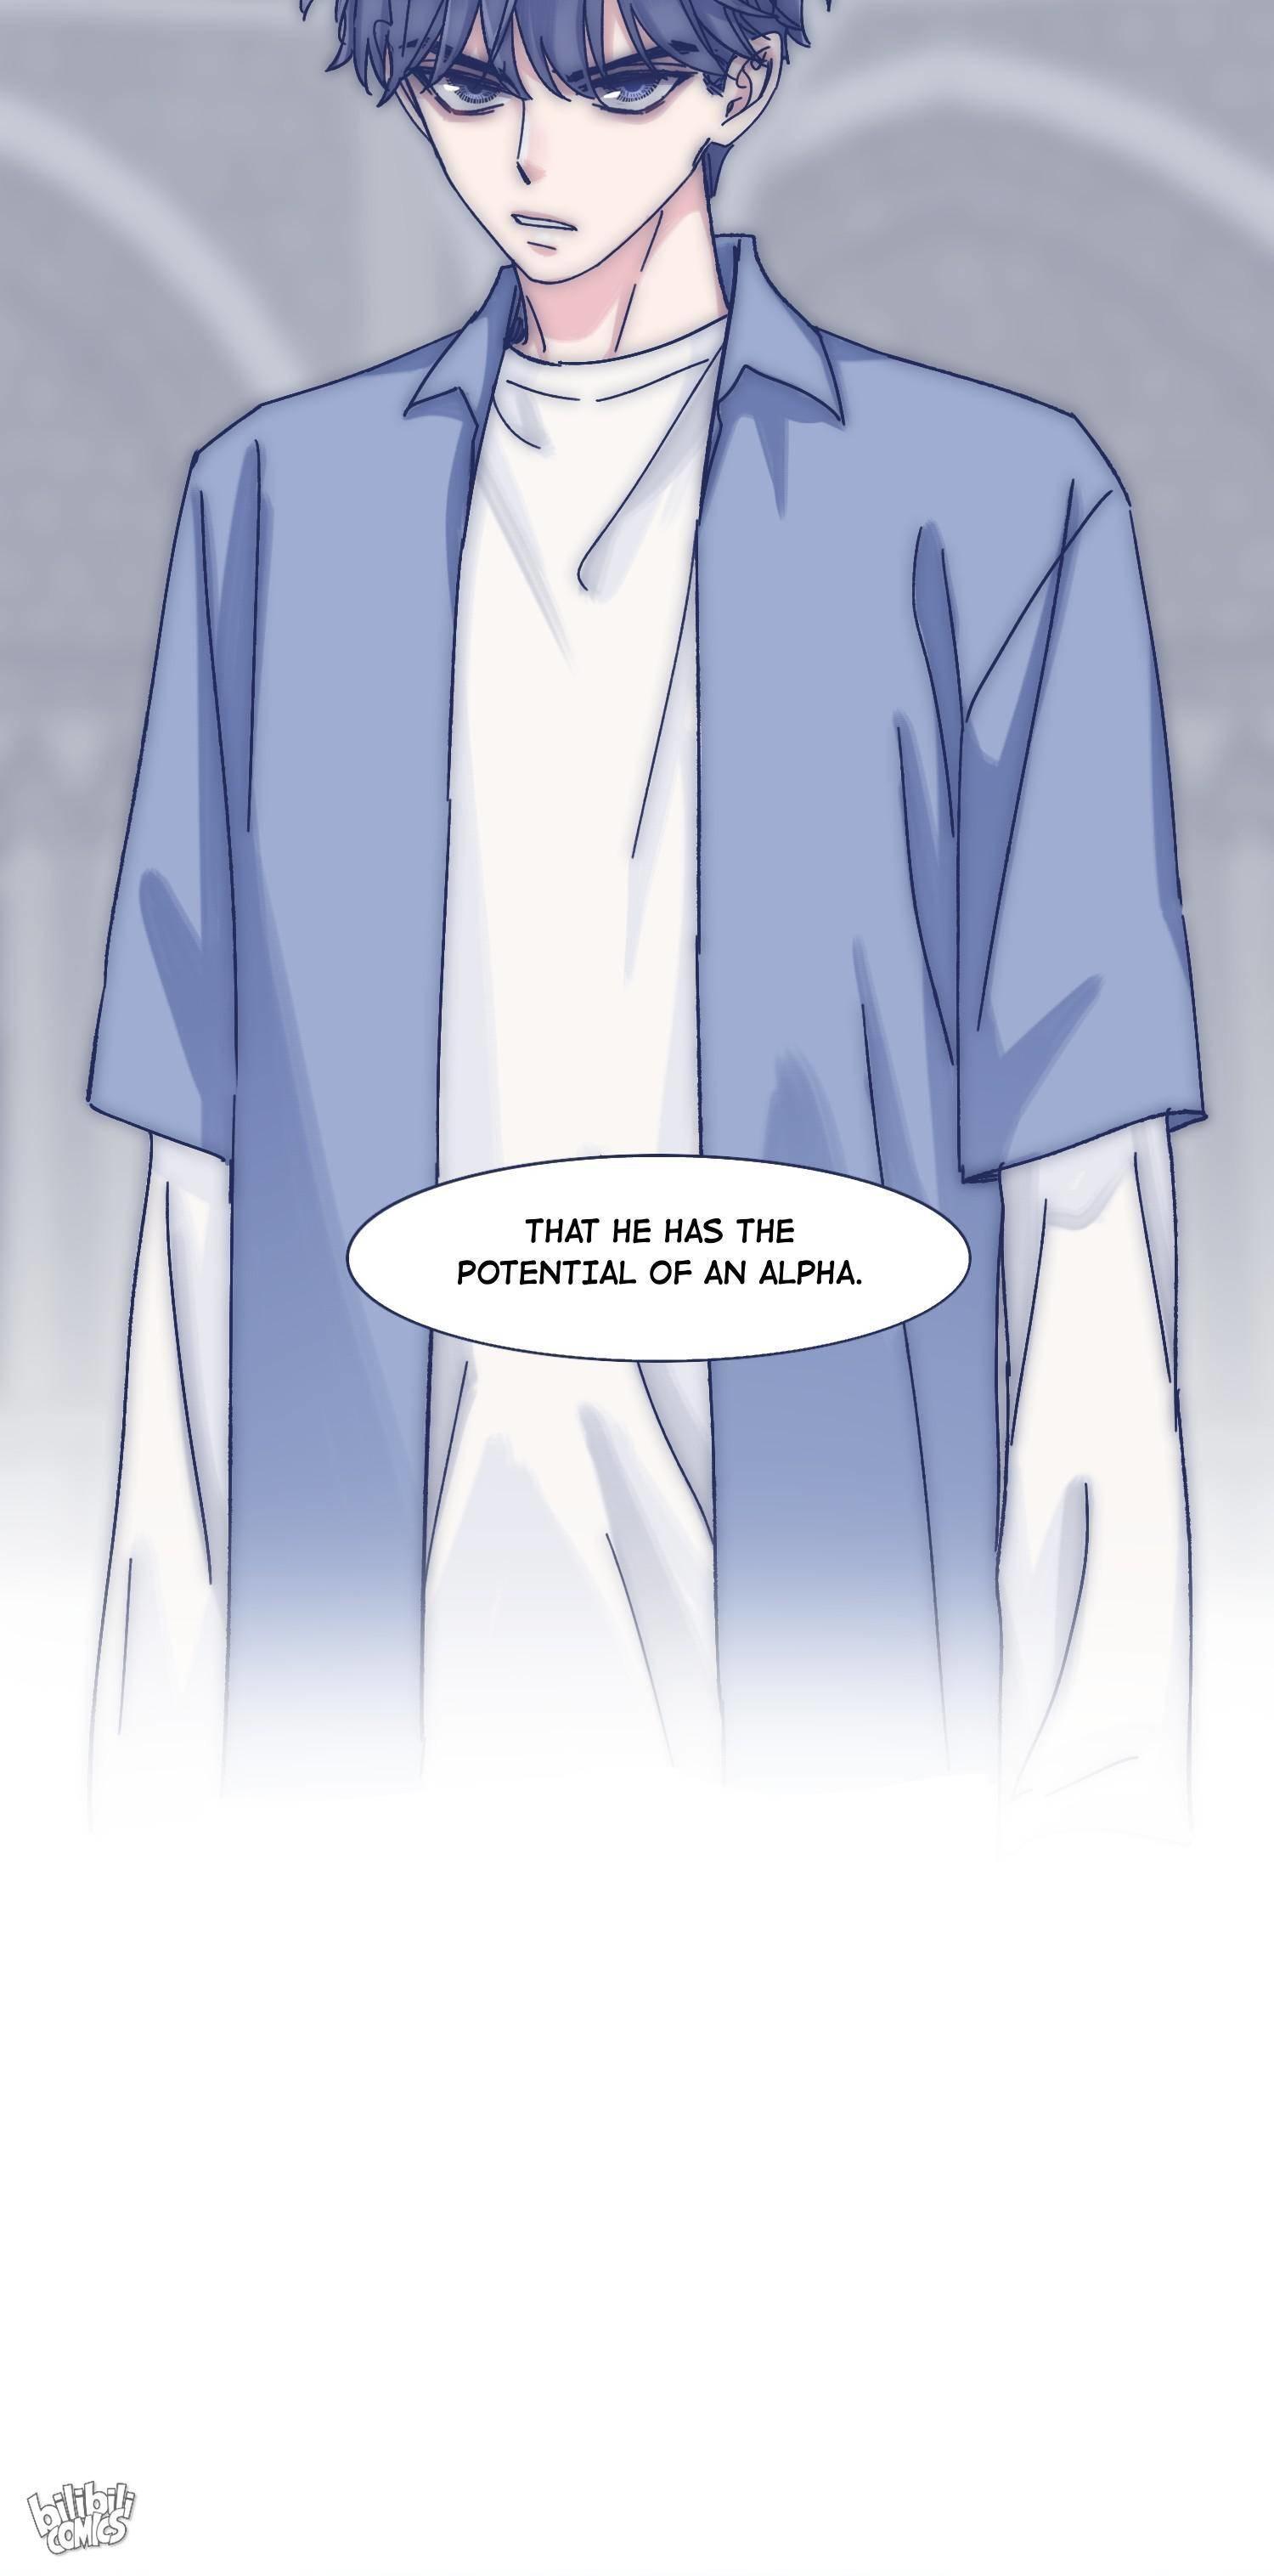 I Offer My Neck To You Chapter 68 page 35 - Mangakakalot